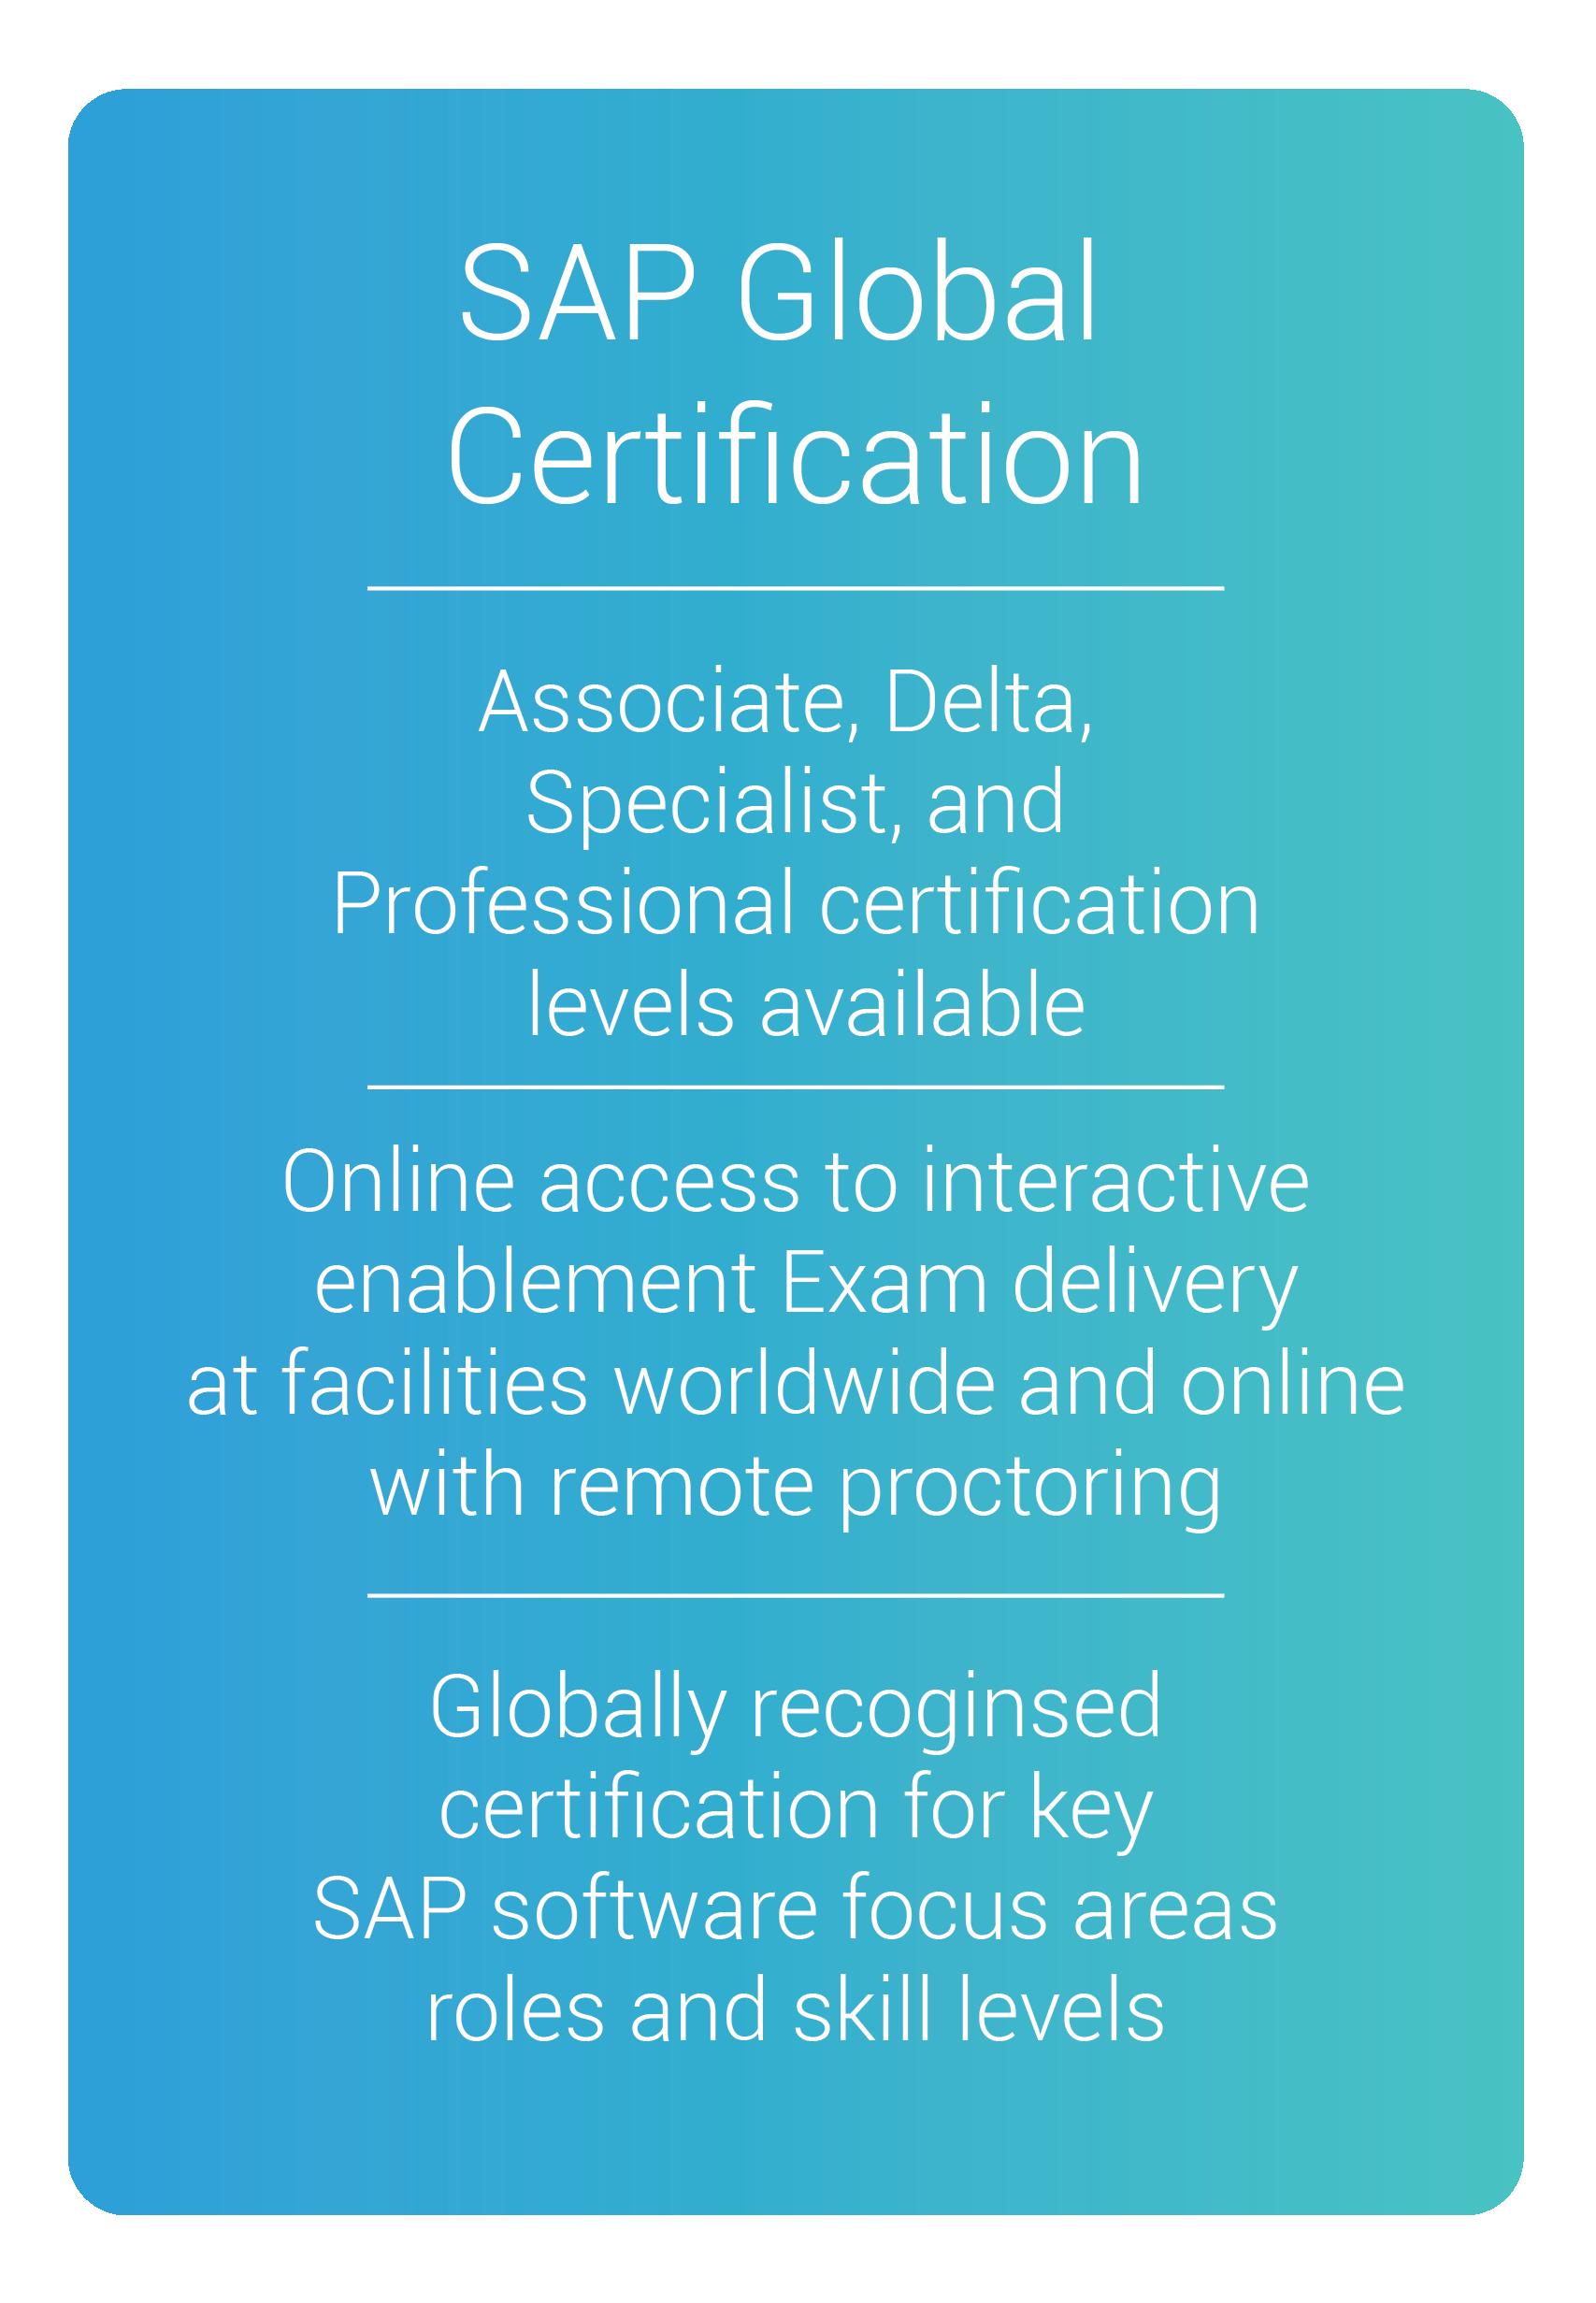 sap global certification online training